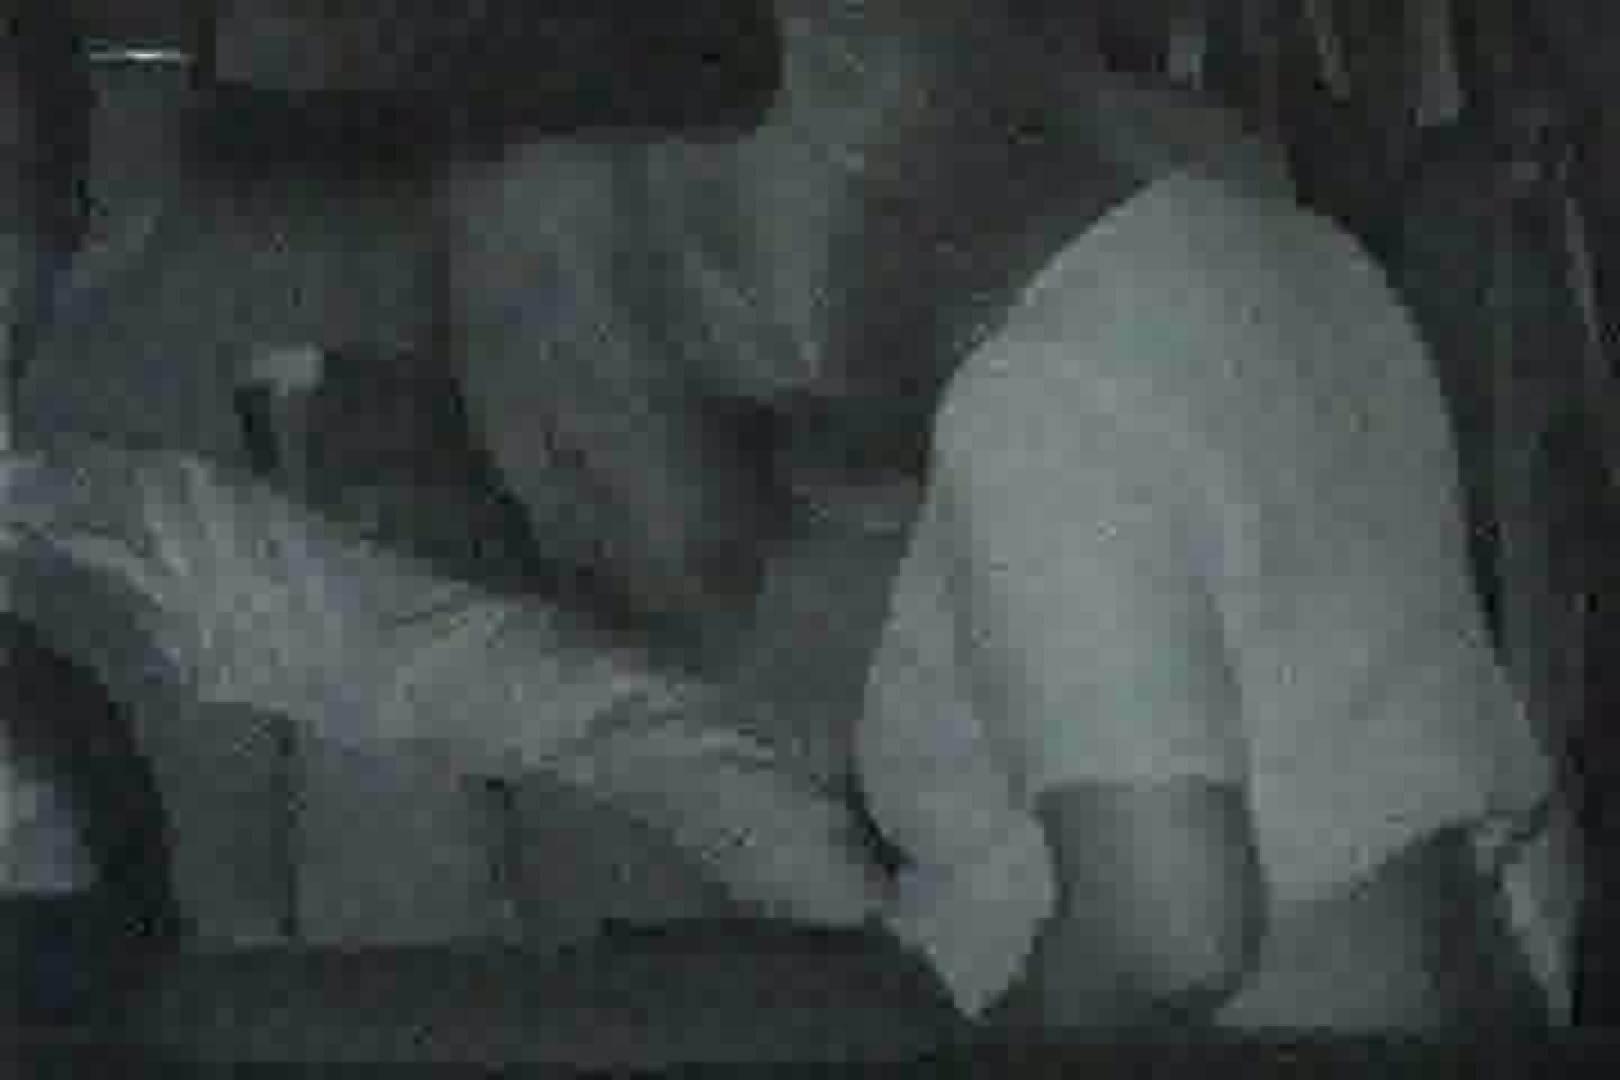 充血監督の深夜の運動会Vol.30 貧乳 エロ無料画像 51画像 16